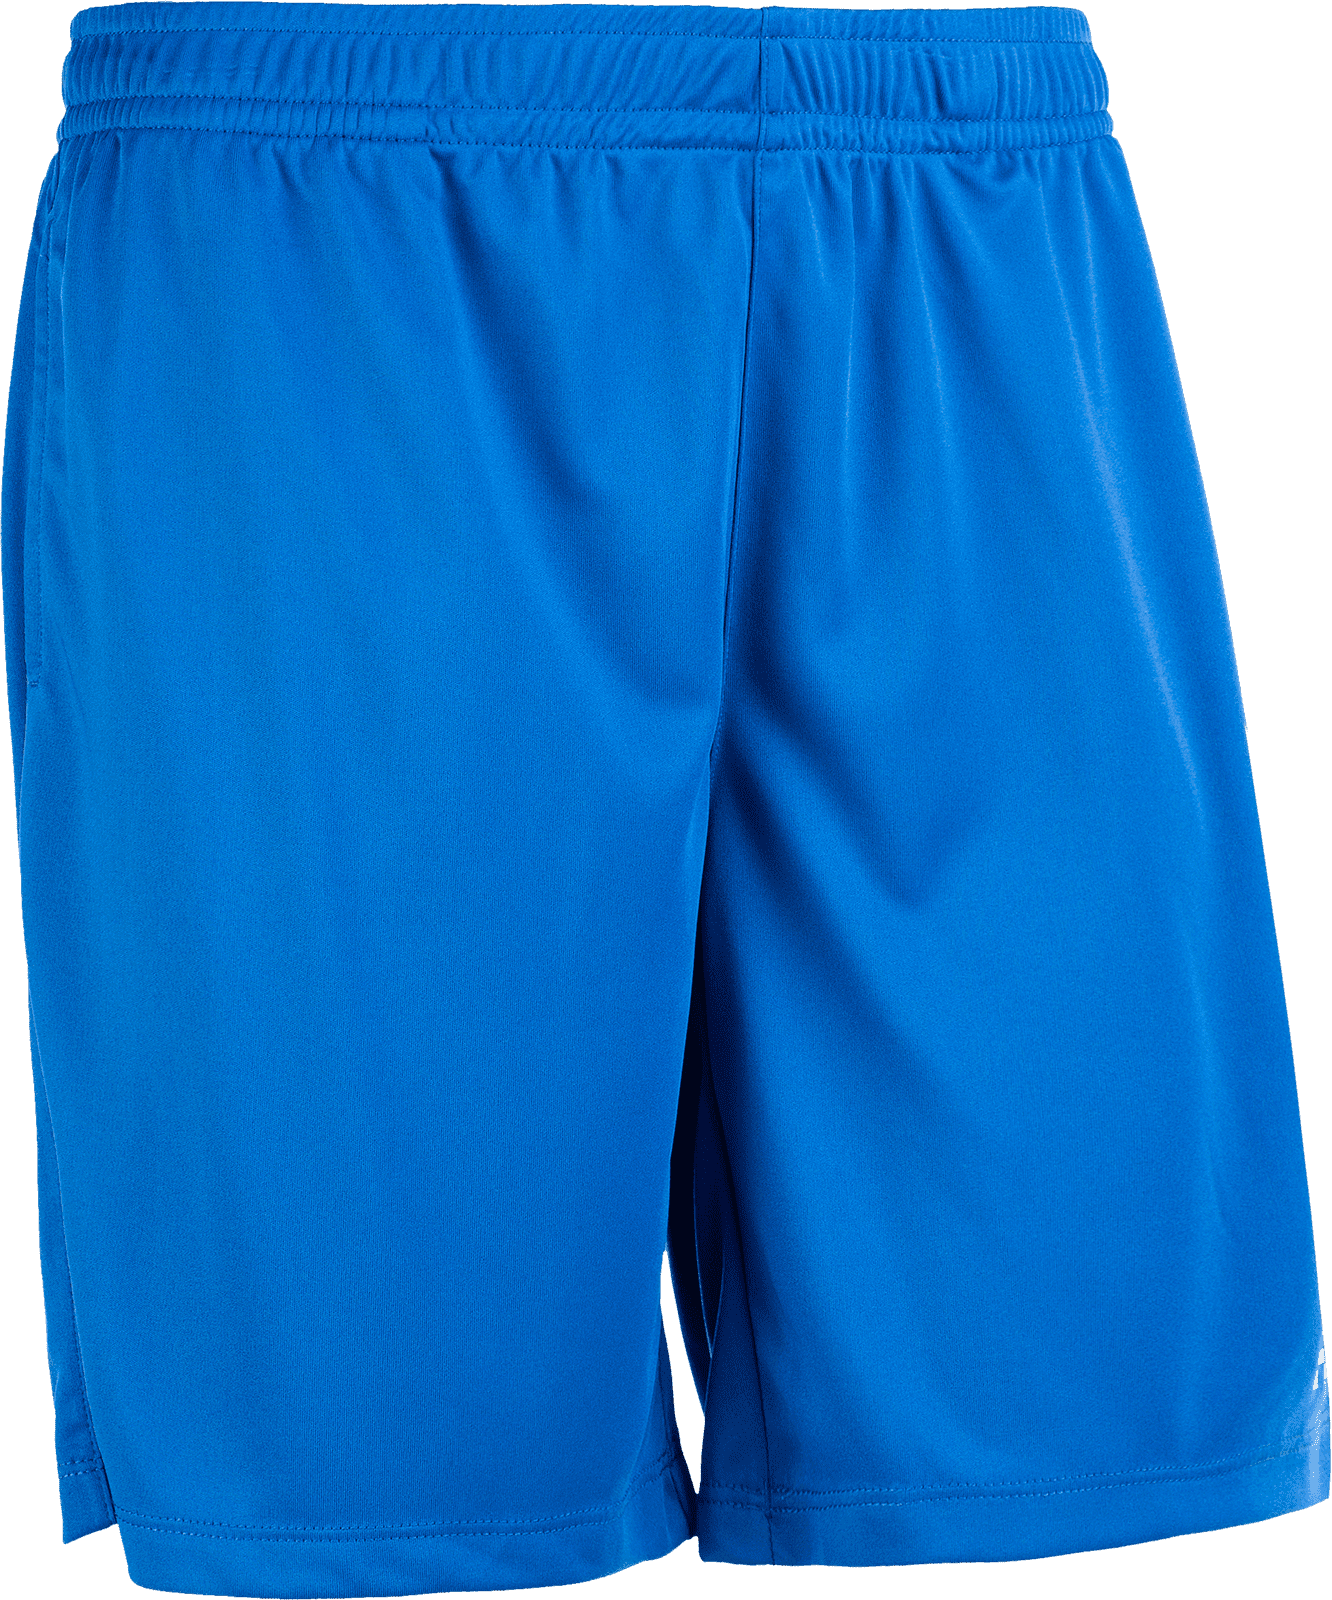 Forza Landers Shorts, 2037 Estate Blue